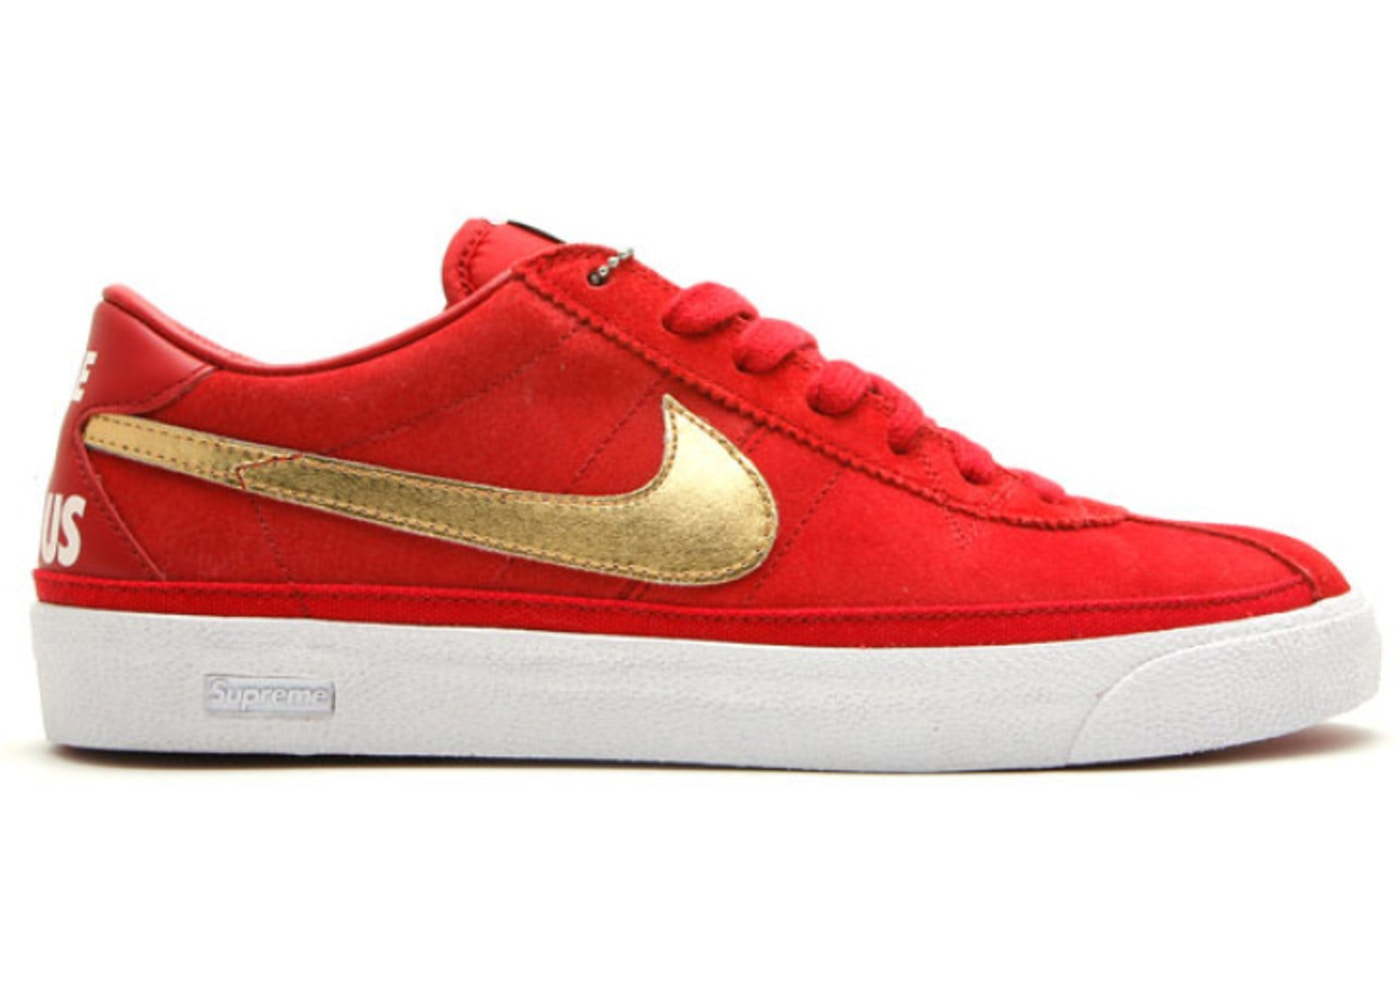 Nike SB Bruin Supreme Metallic Gold - 363319-671 374a1d1c77